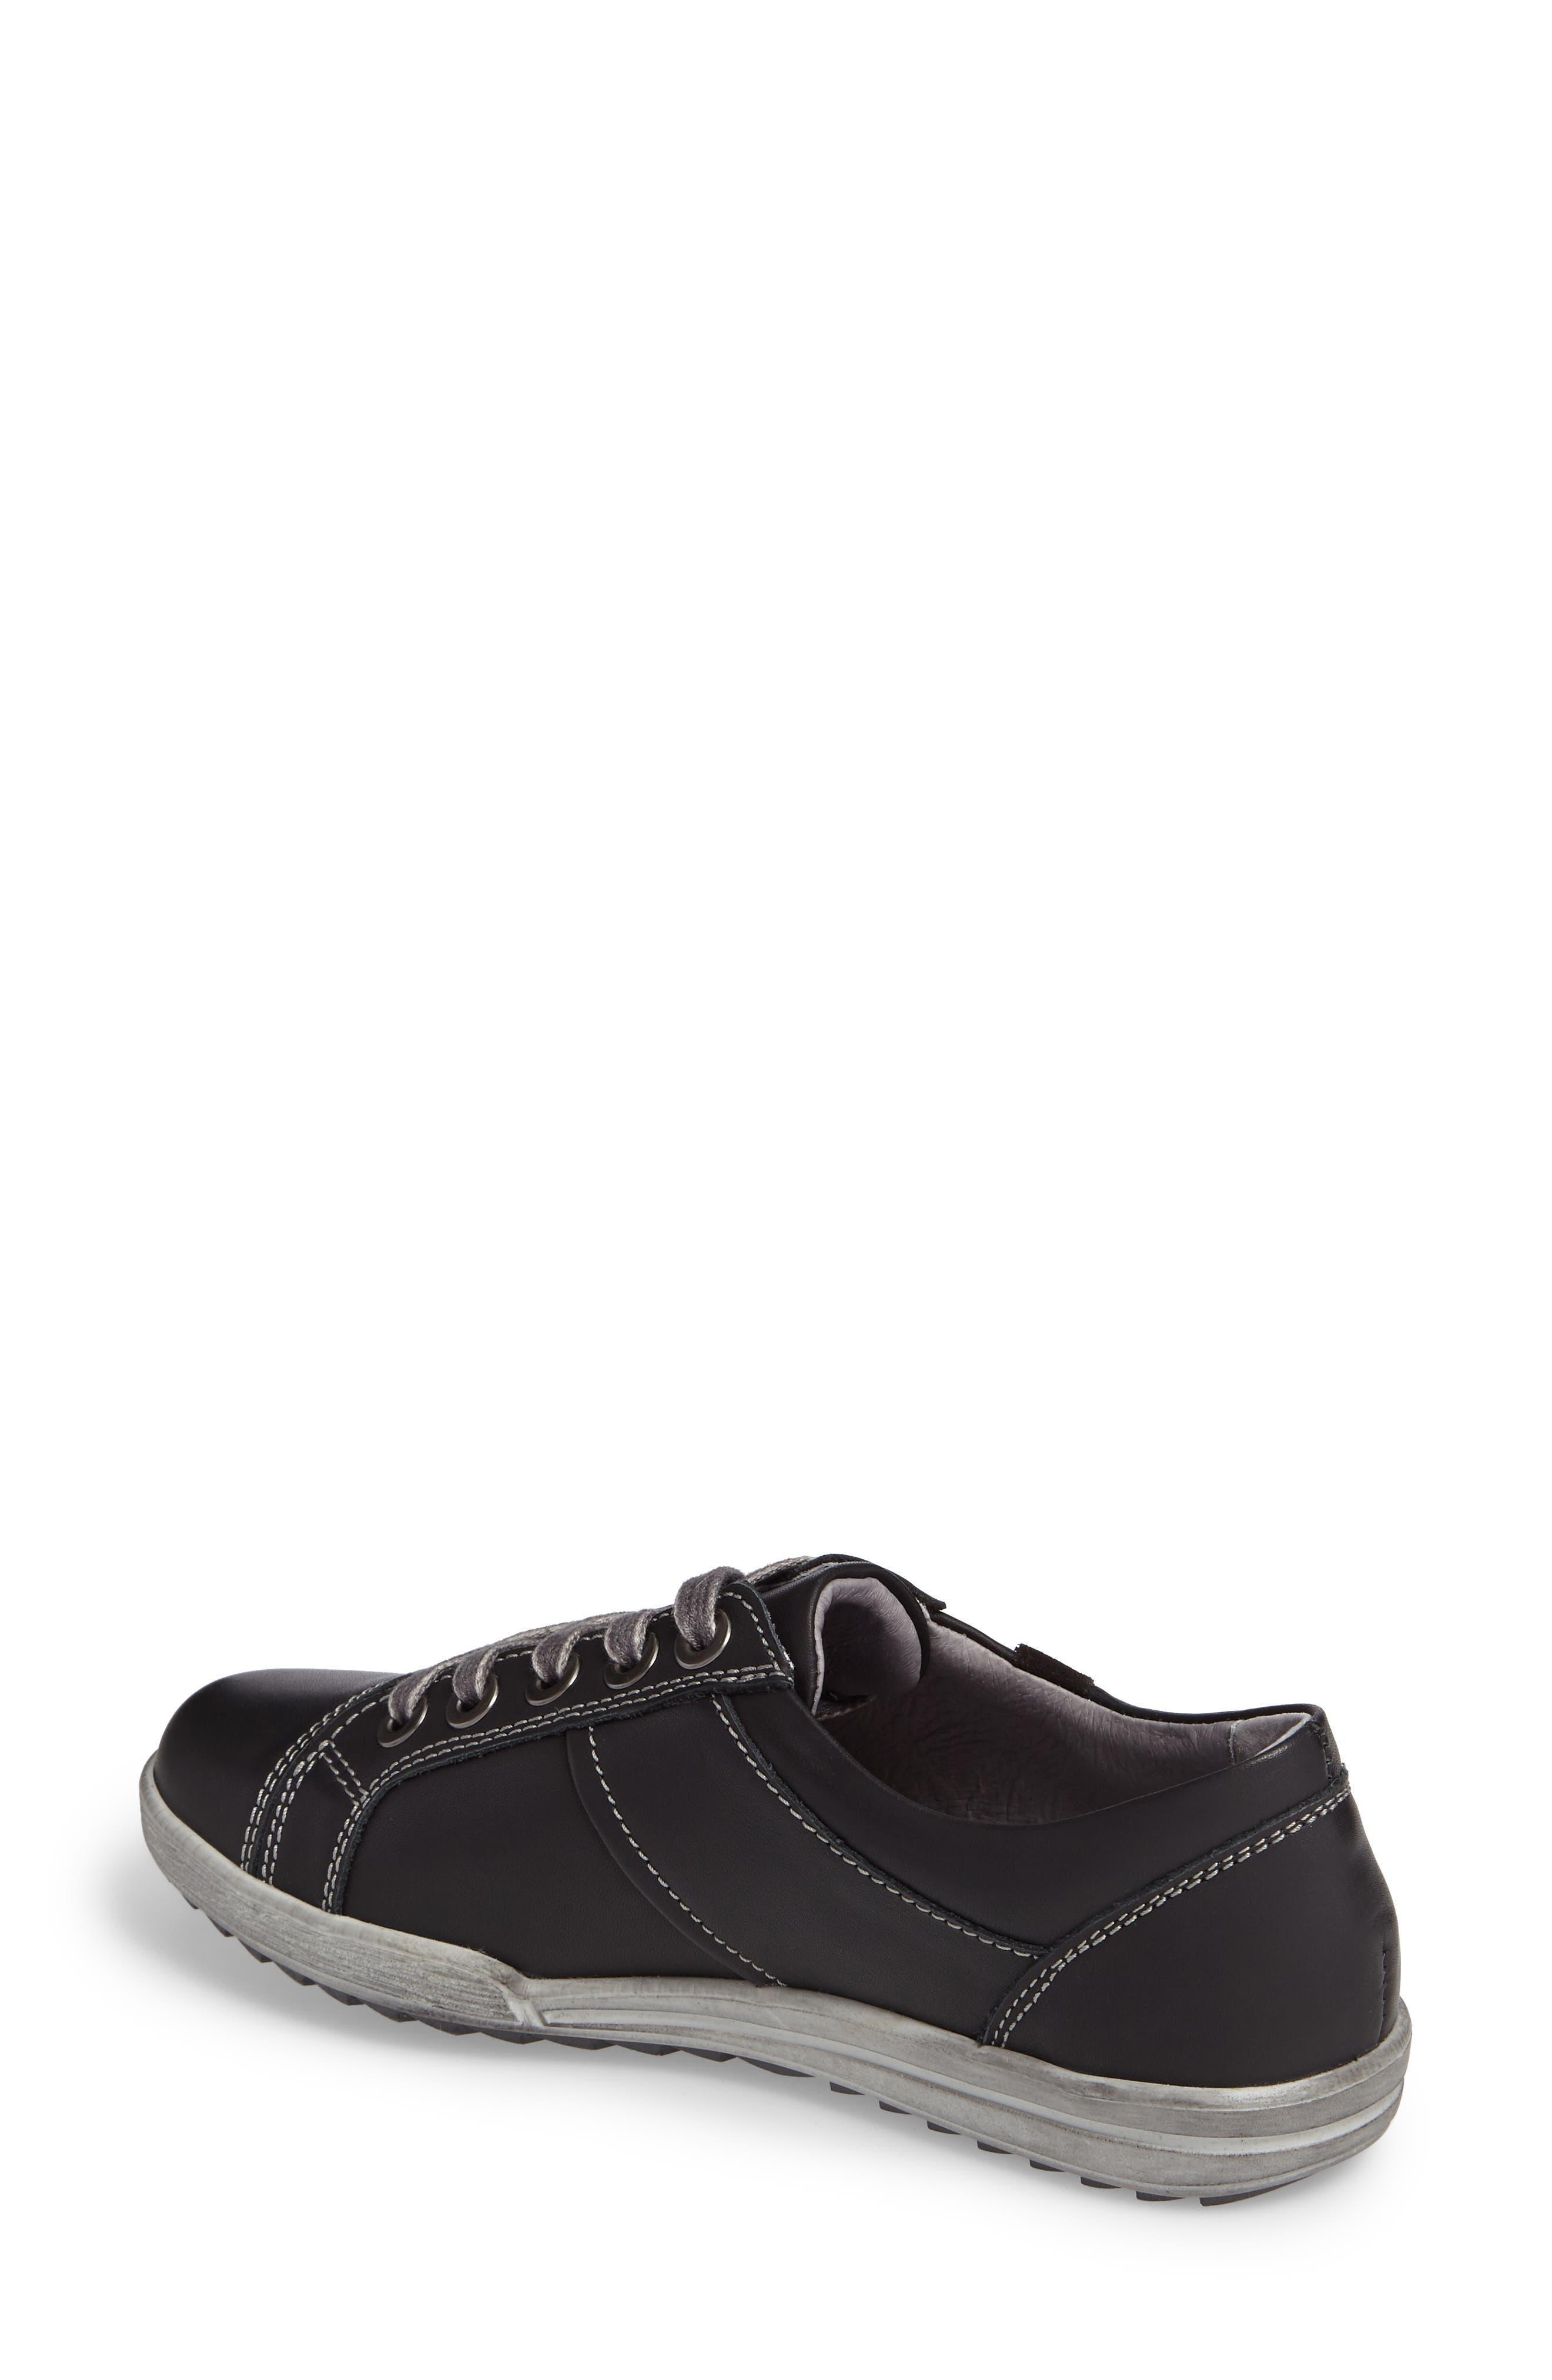 Dany 59 Sneaker,                             Alternate thumbnail 2, color,                             002